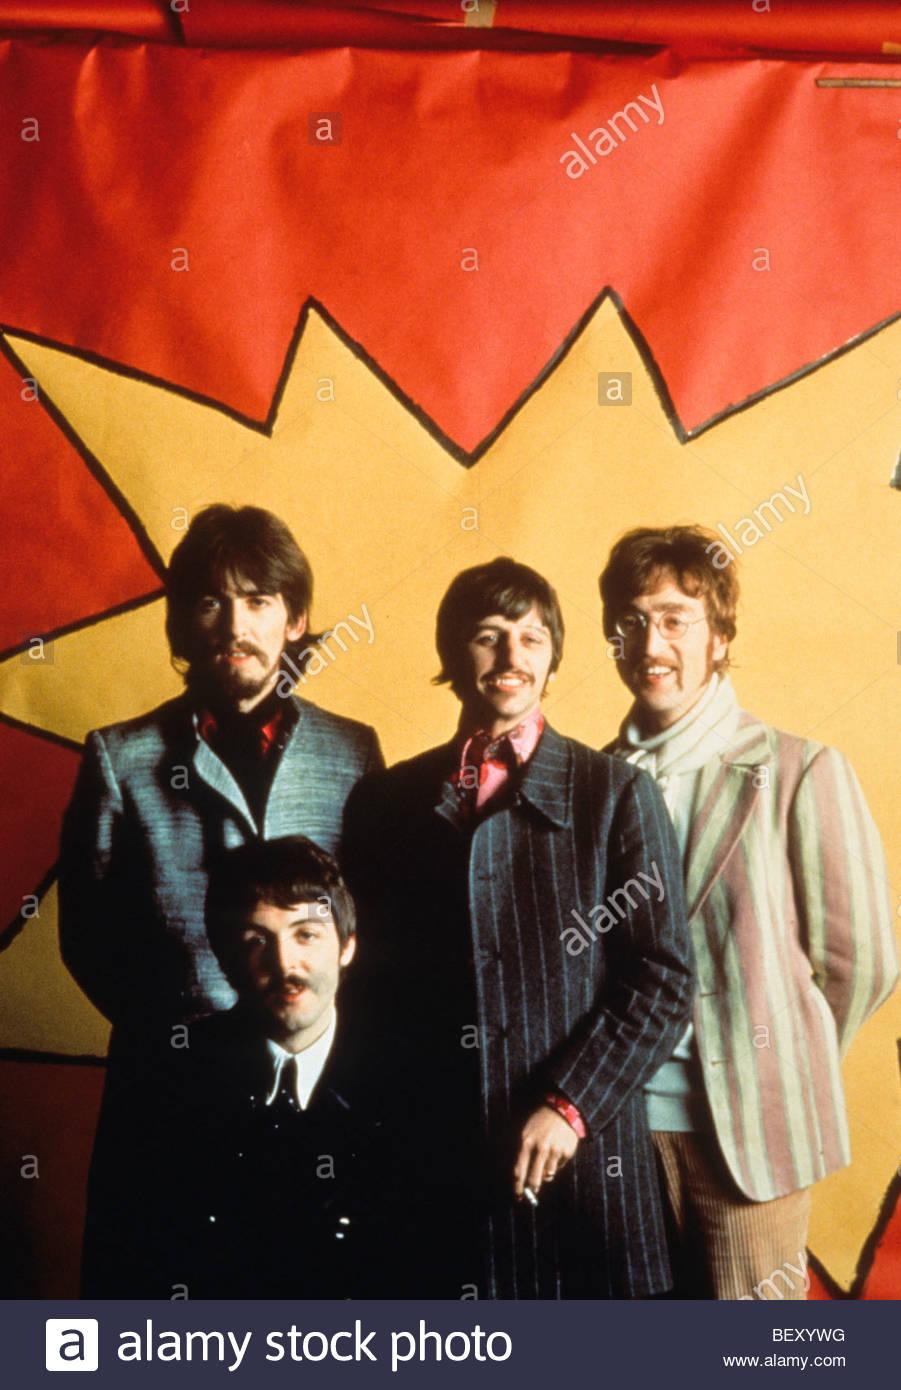 the beatles'george harrison'john lennon'paul mccartney'ringo starr - Stock Image